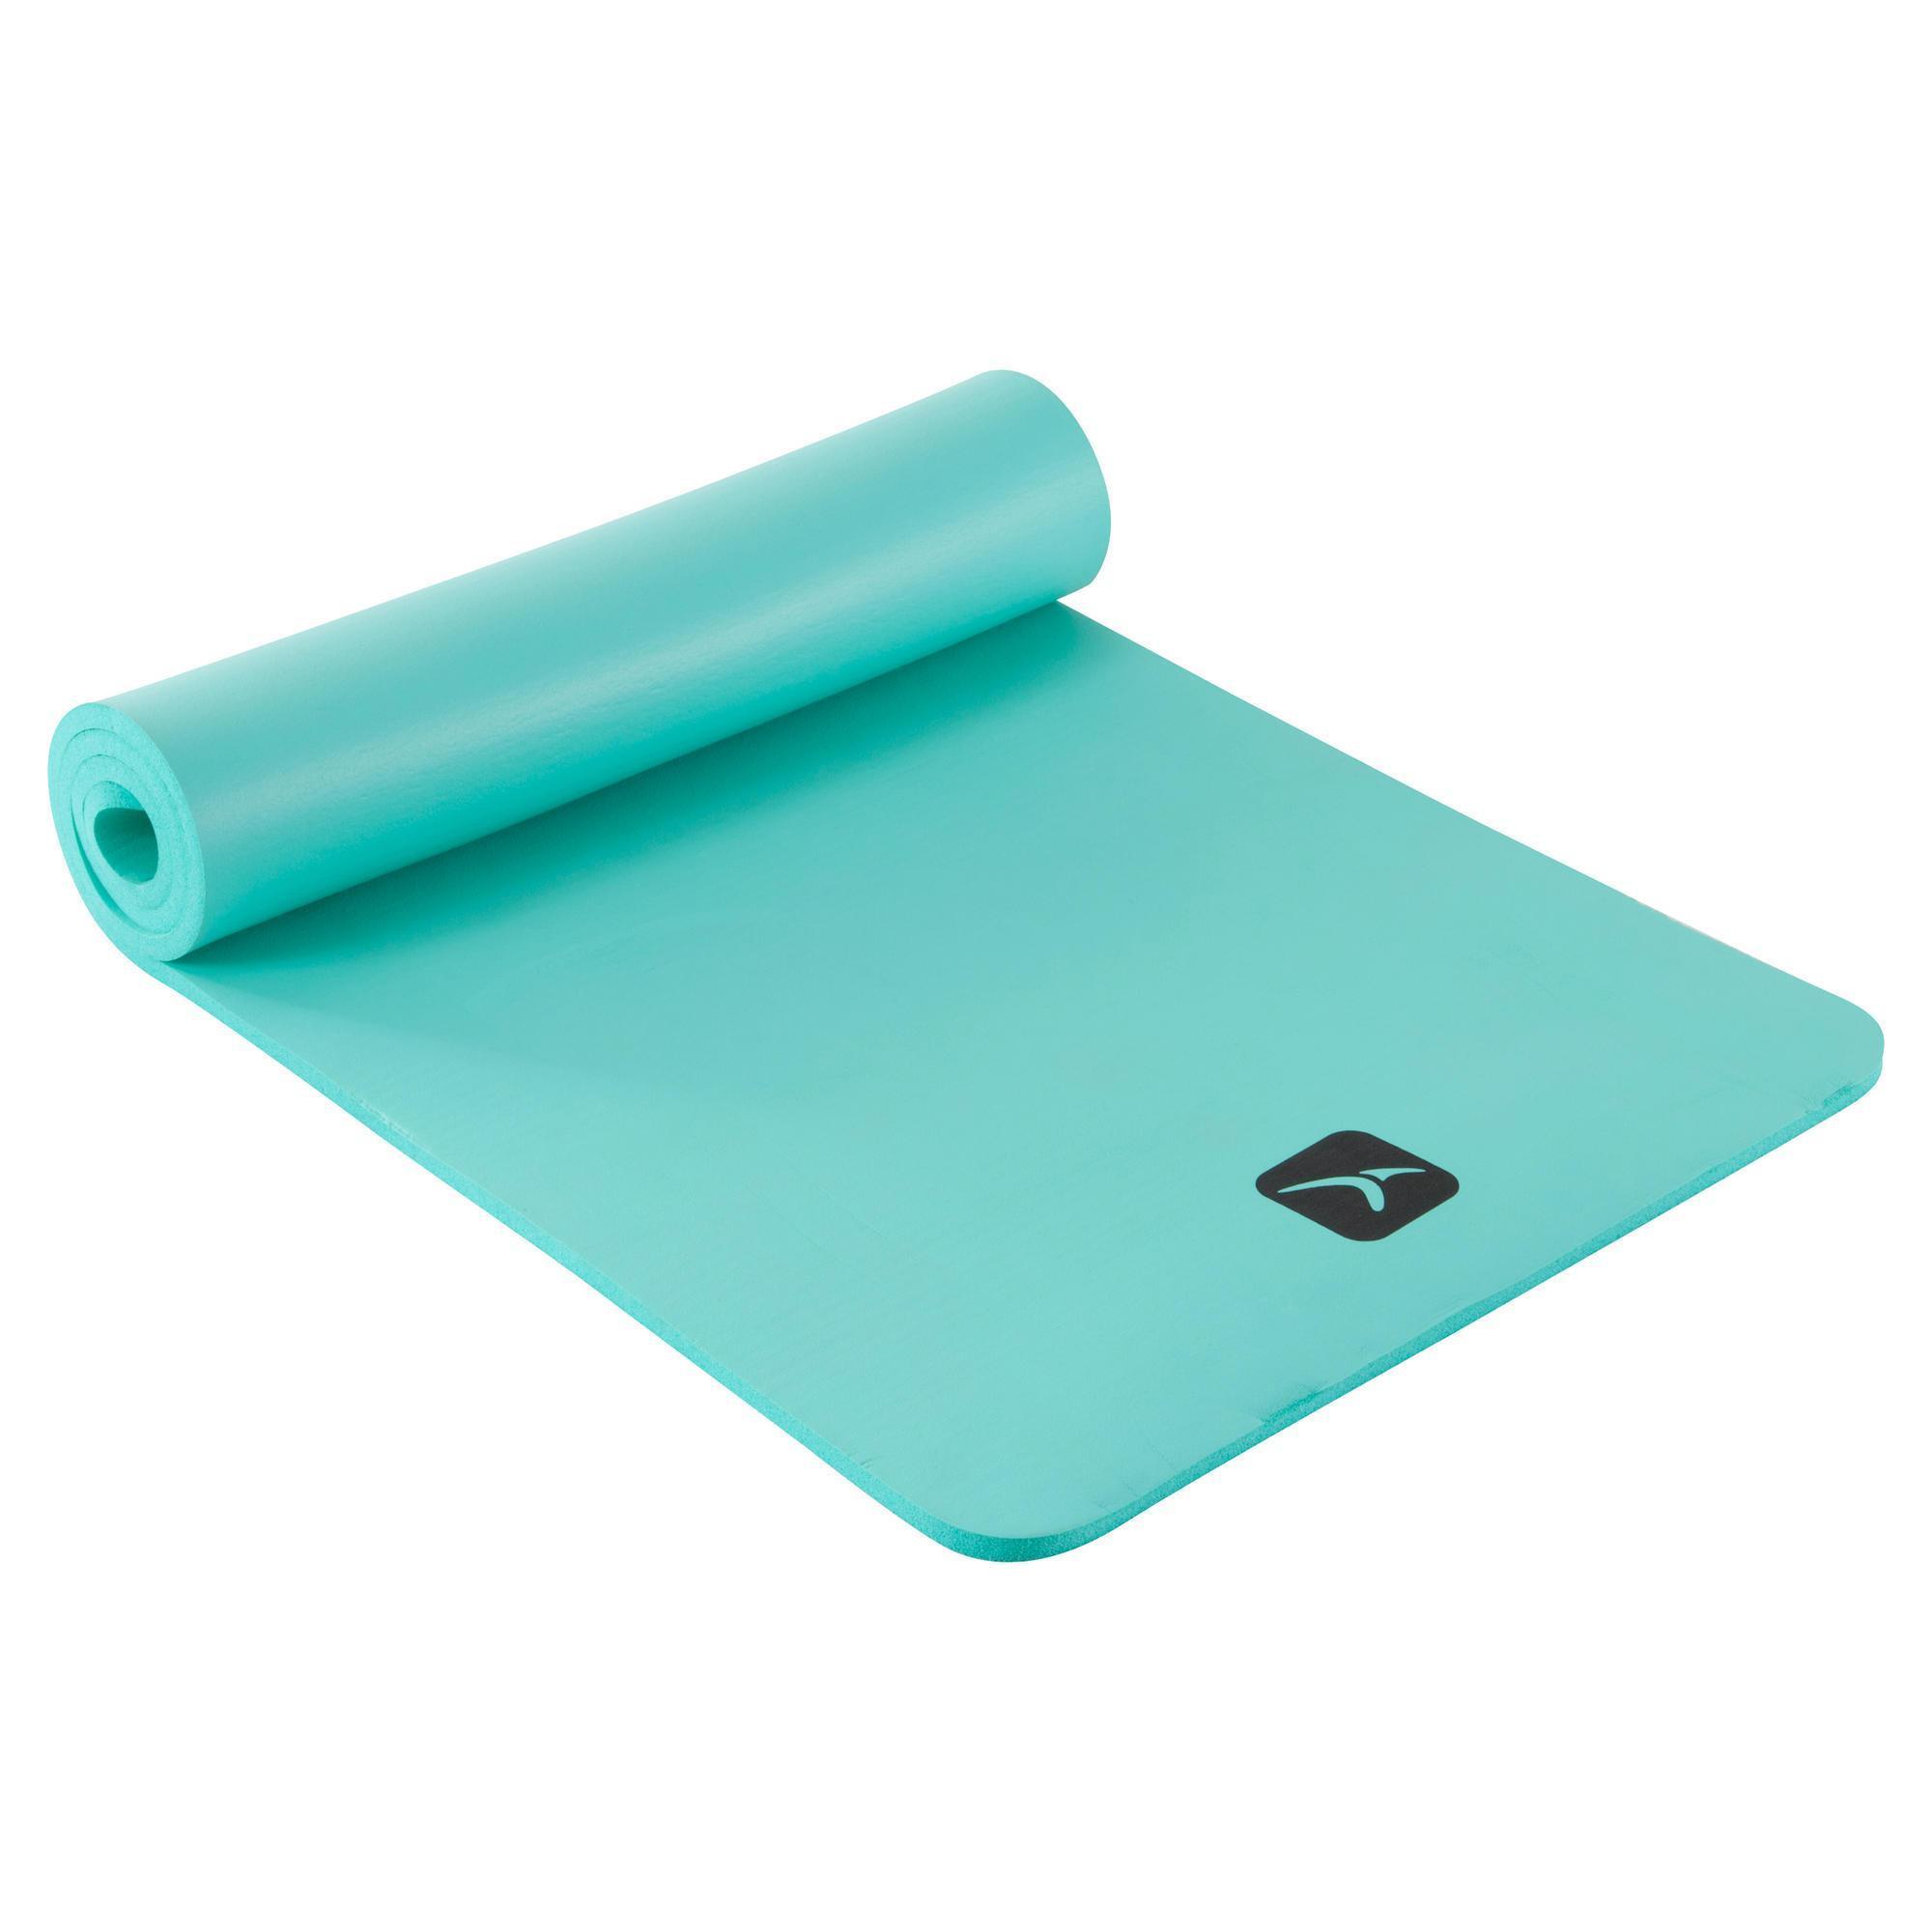 tapis gym pilates confort vert domyos by decathlon. Black Bedroom Furniture Sets. Home Design Ideas